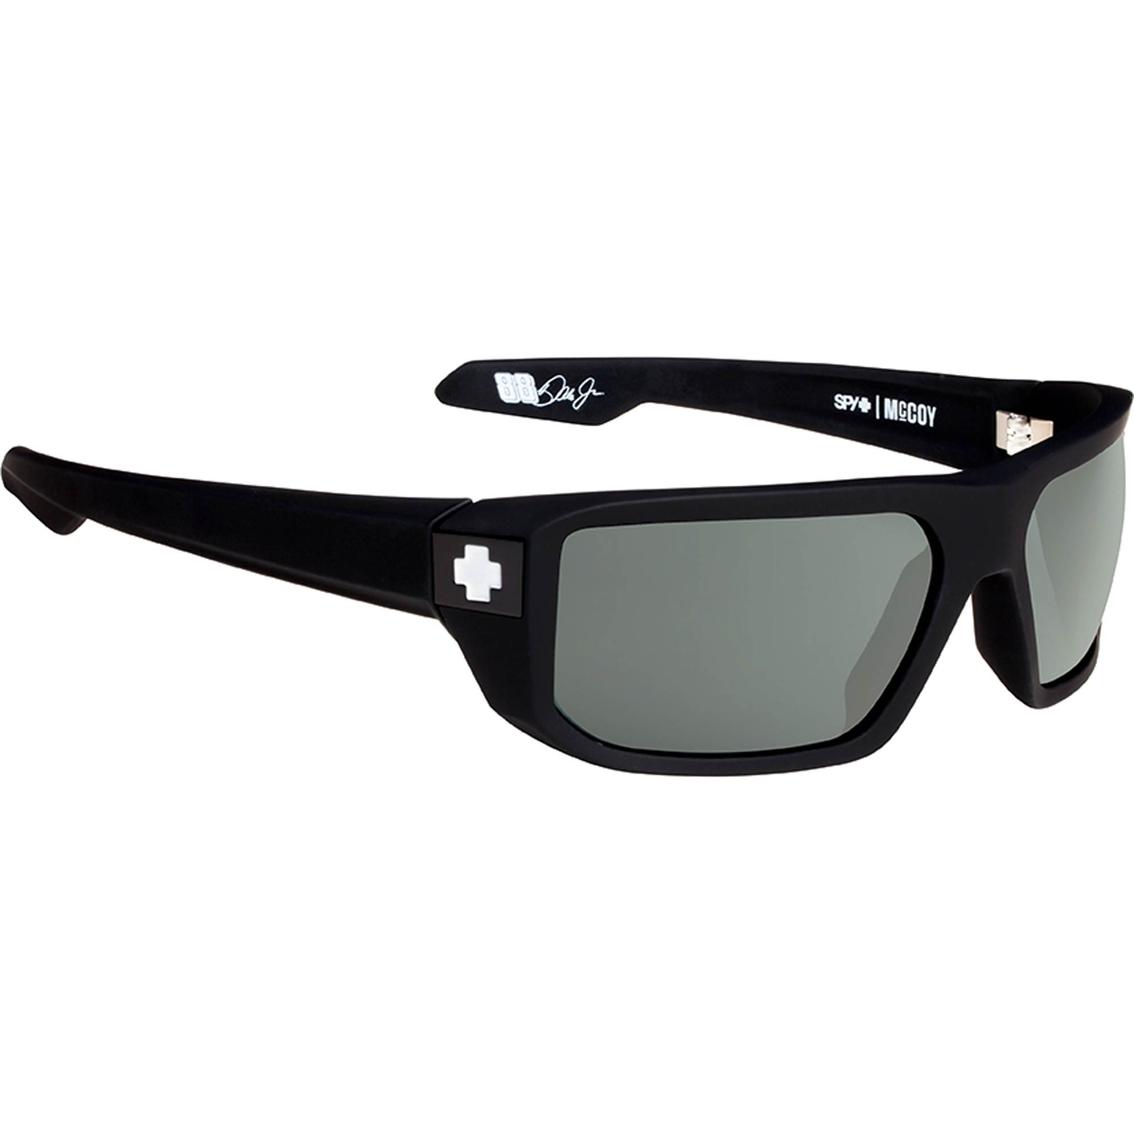 8e3a0cbe7f Spy Optic Mccoy Plastic Rectangle Happy Lens Sunglasses 673012973863 ...